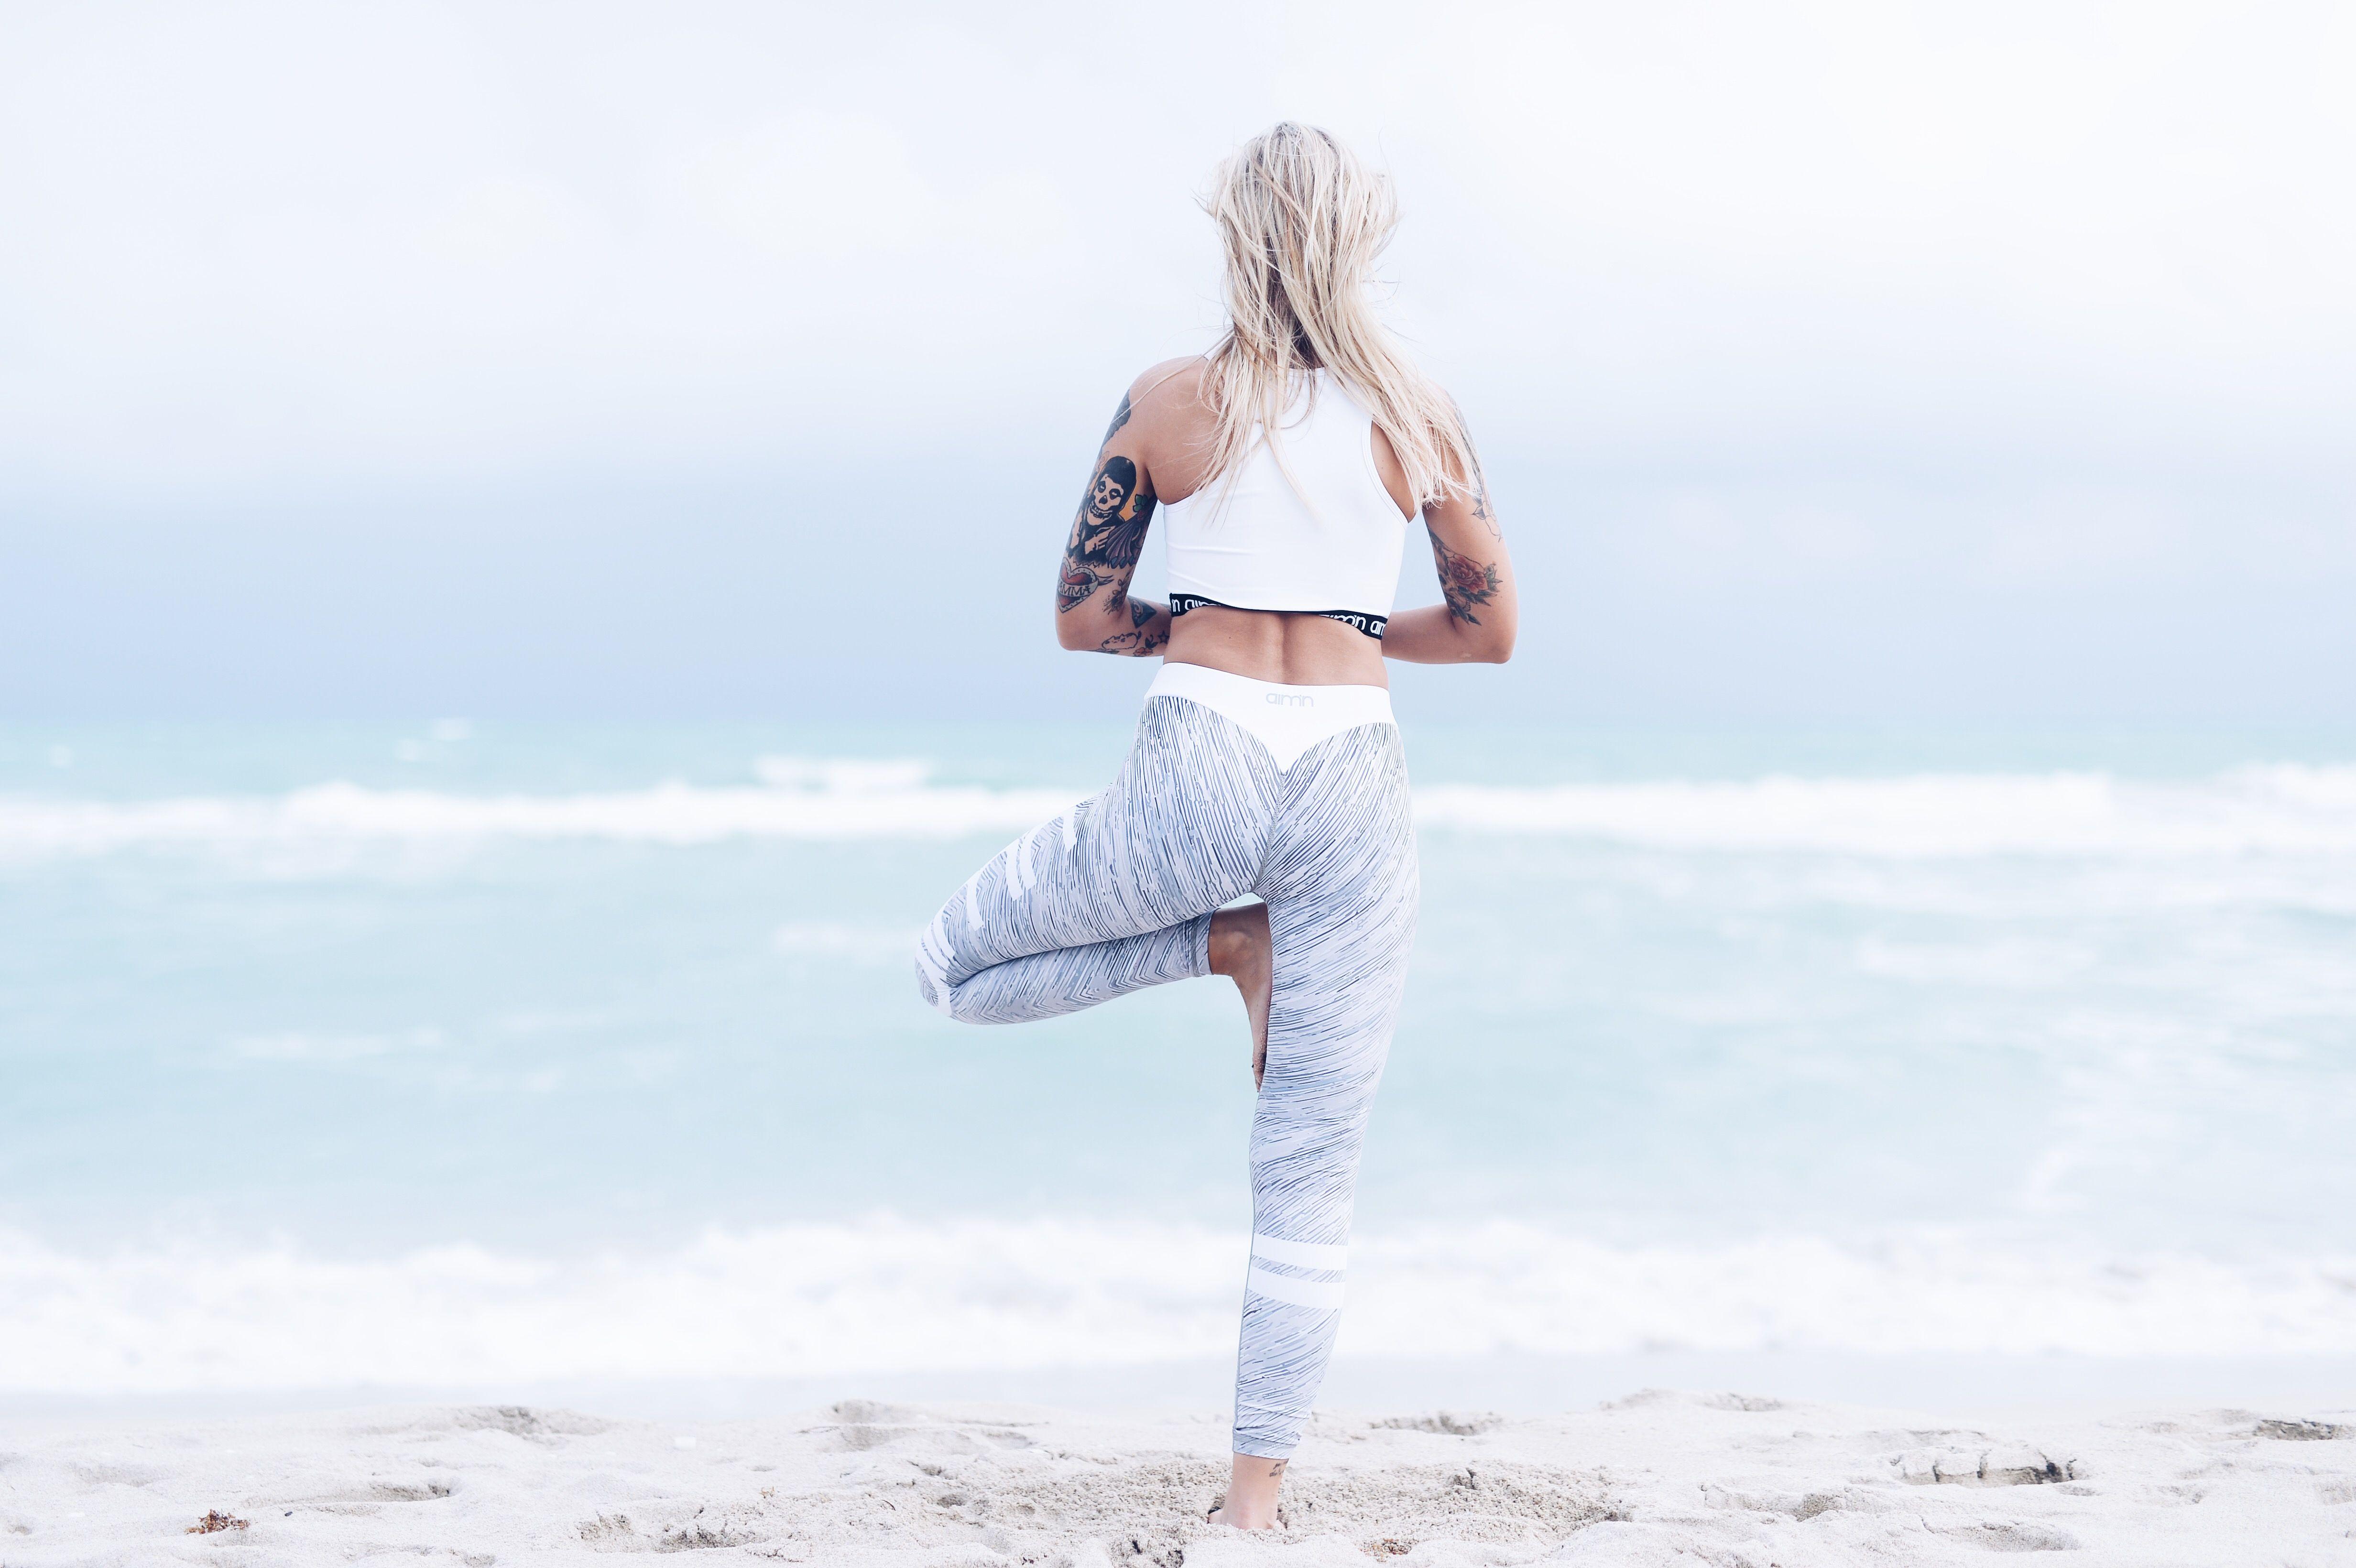 The Tree Yoga Pose Leggings Workout Gym Workout Leggings Colorful Workout Leggings